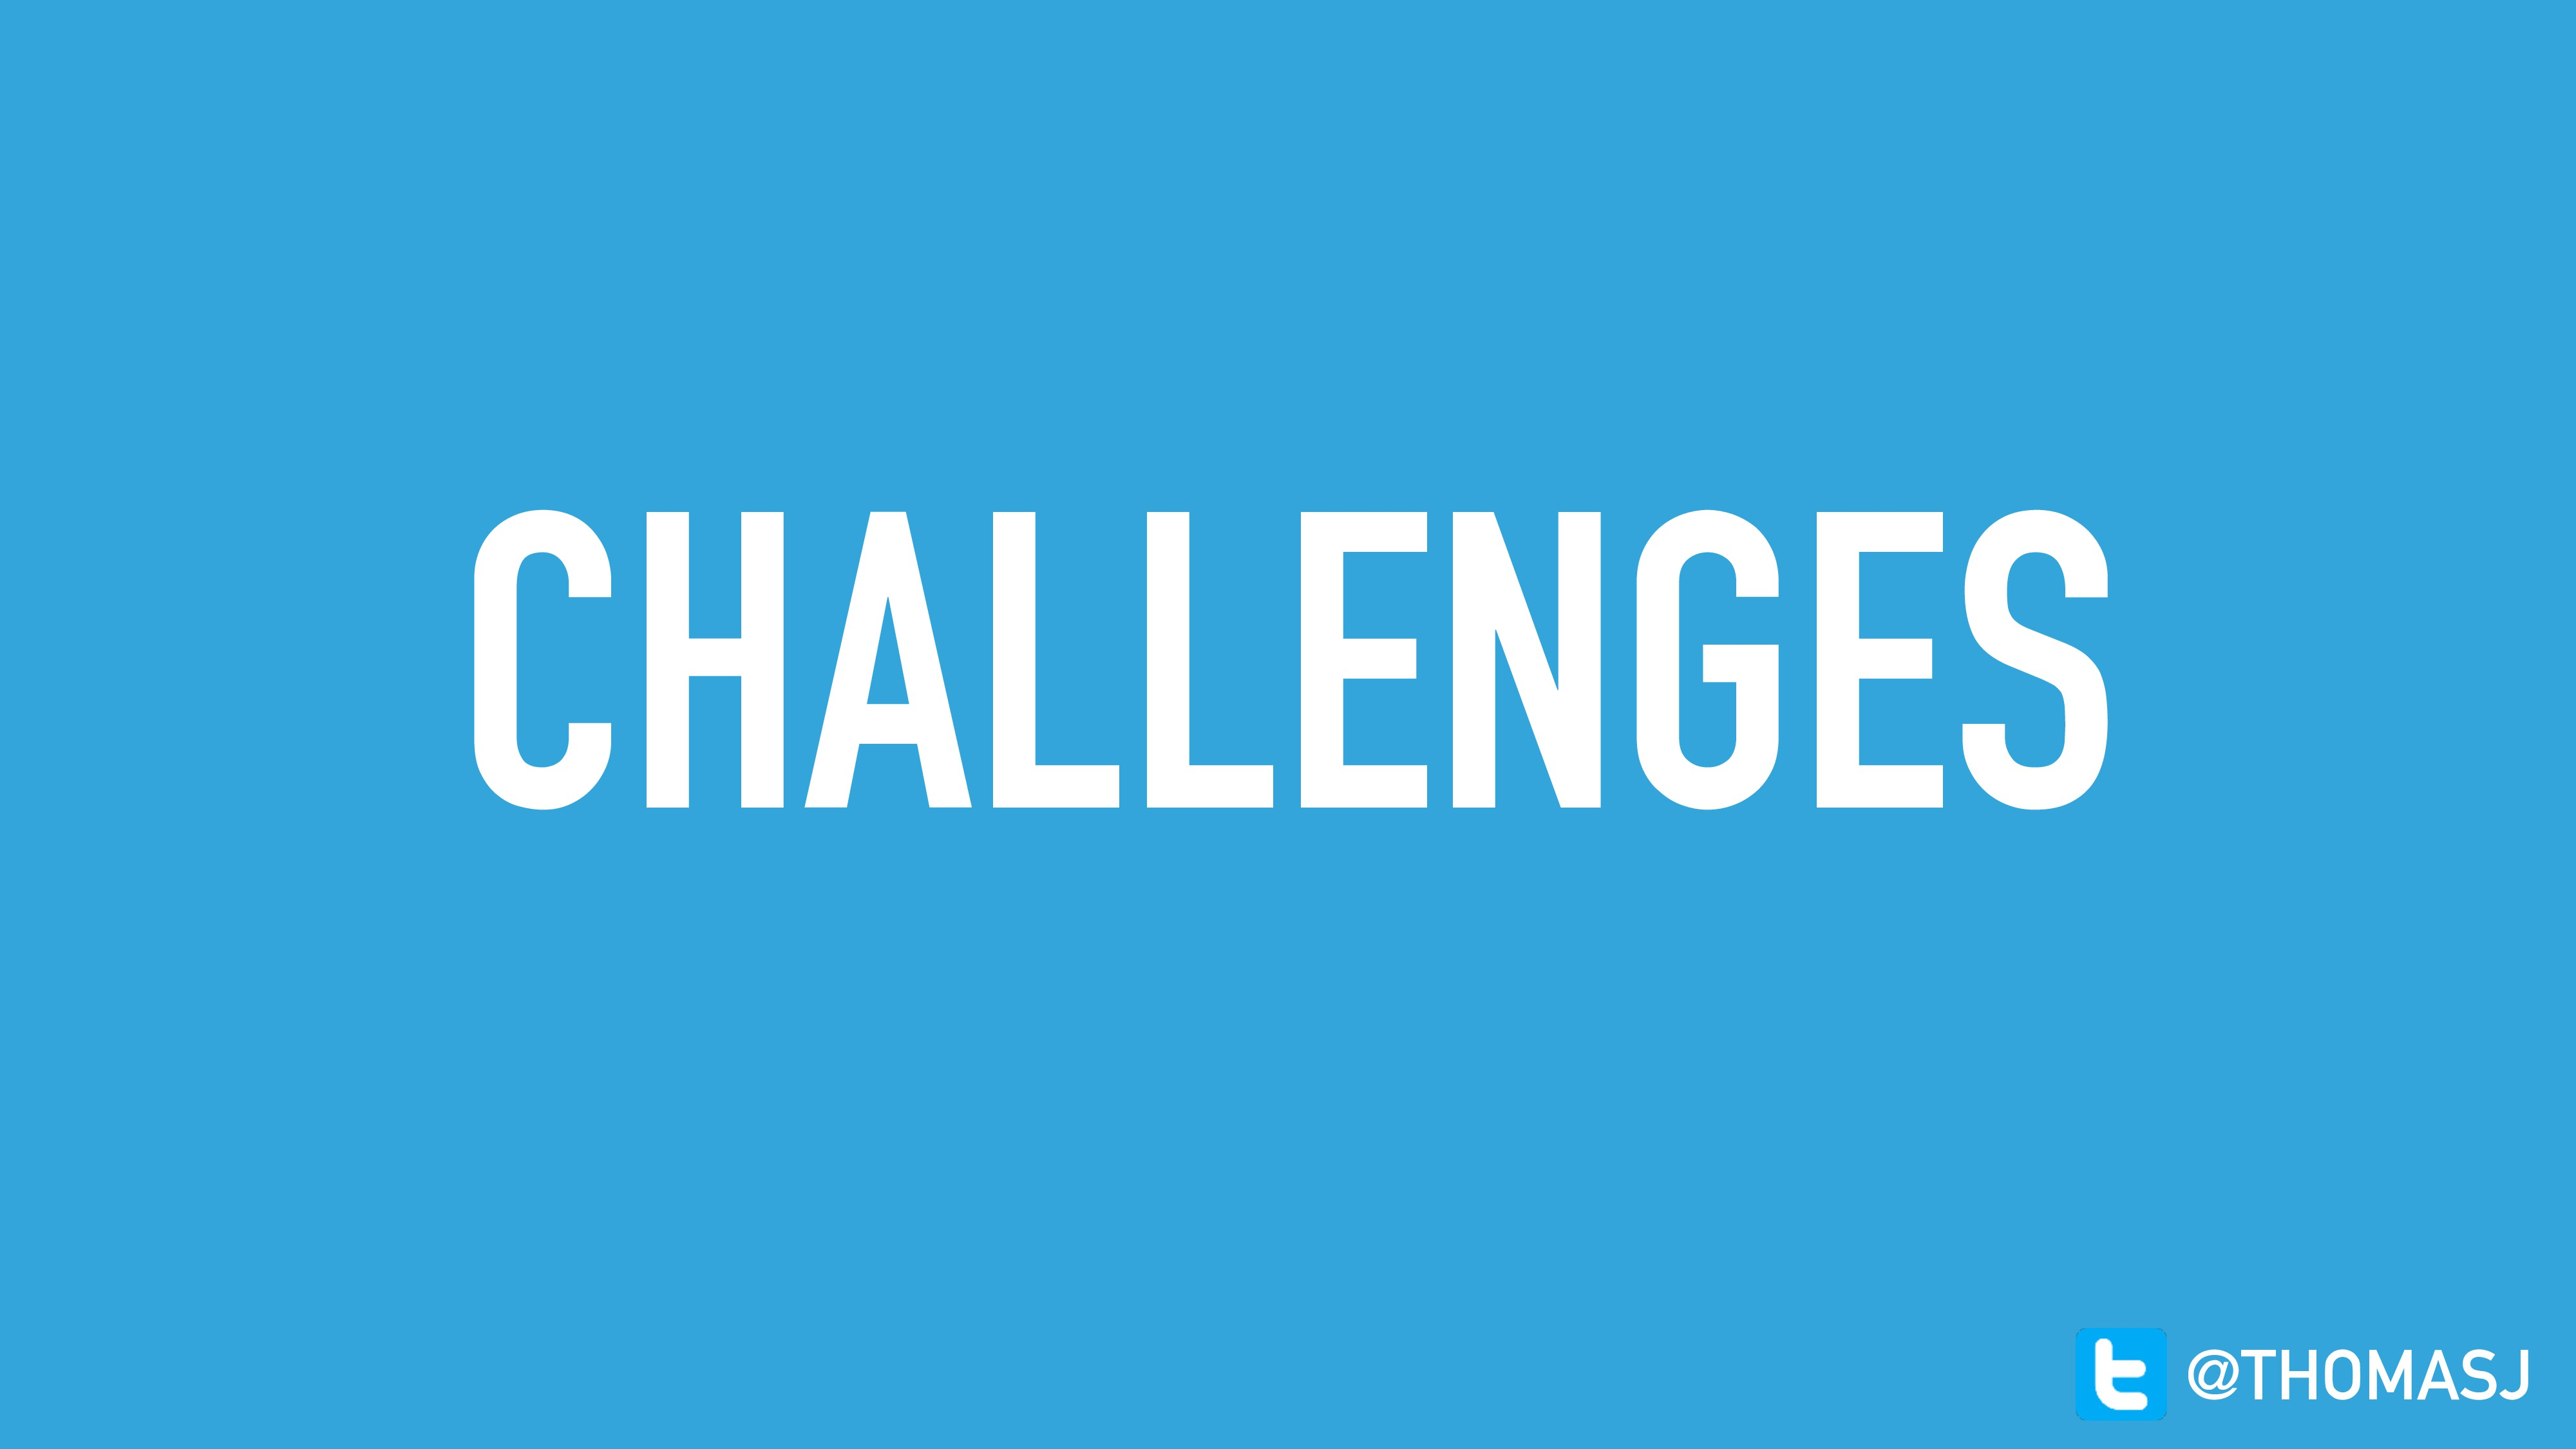 CHALLENGES @THOMASJ